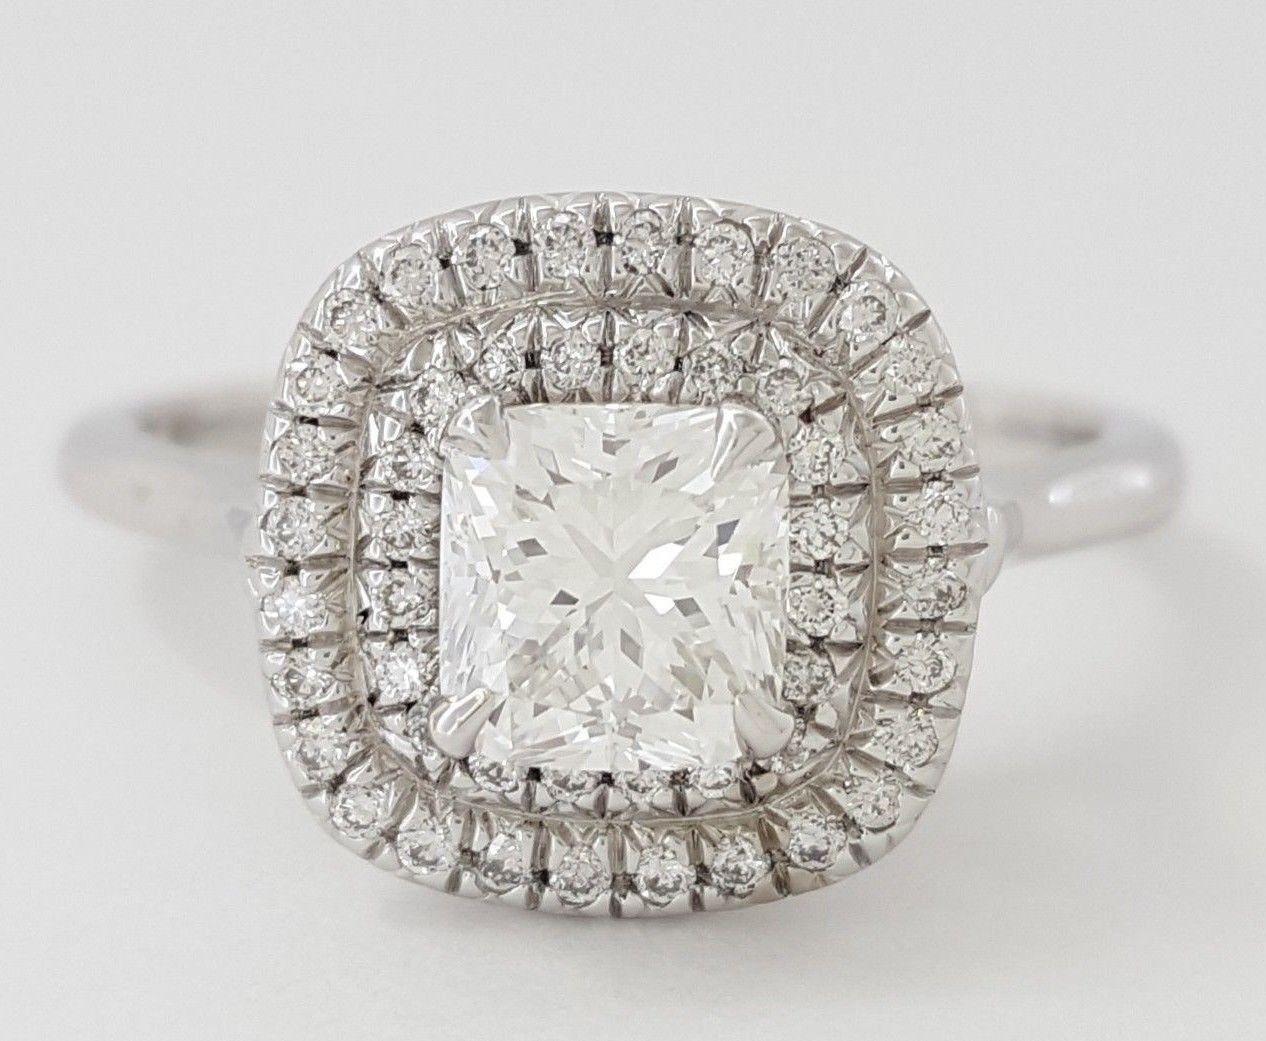 0.97 ct 18K White Gold Cushion Cut Diamond Double Halo Engagement Ring GIA E/VS1